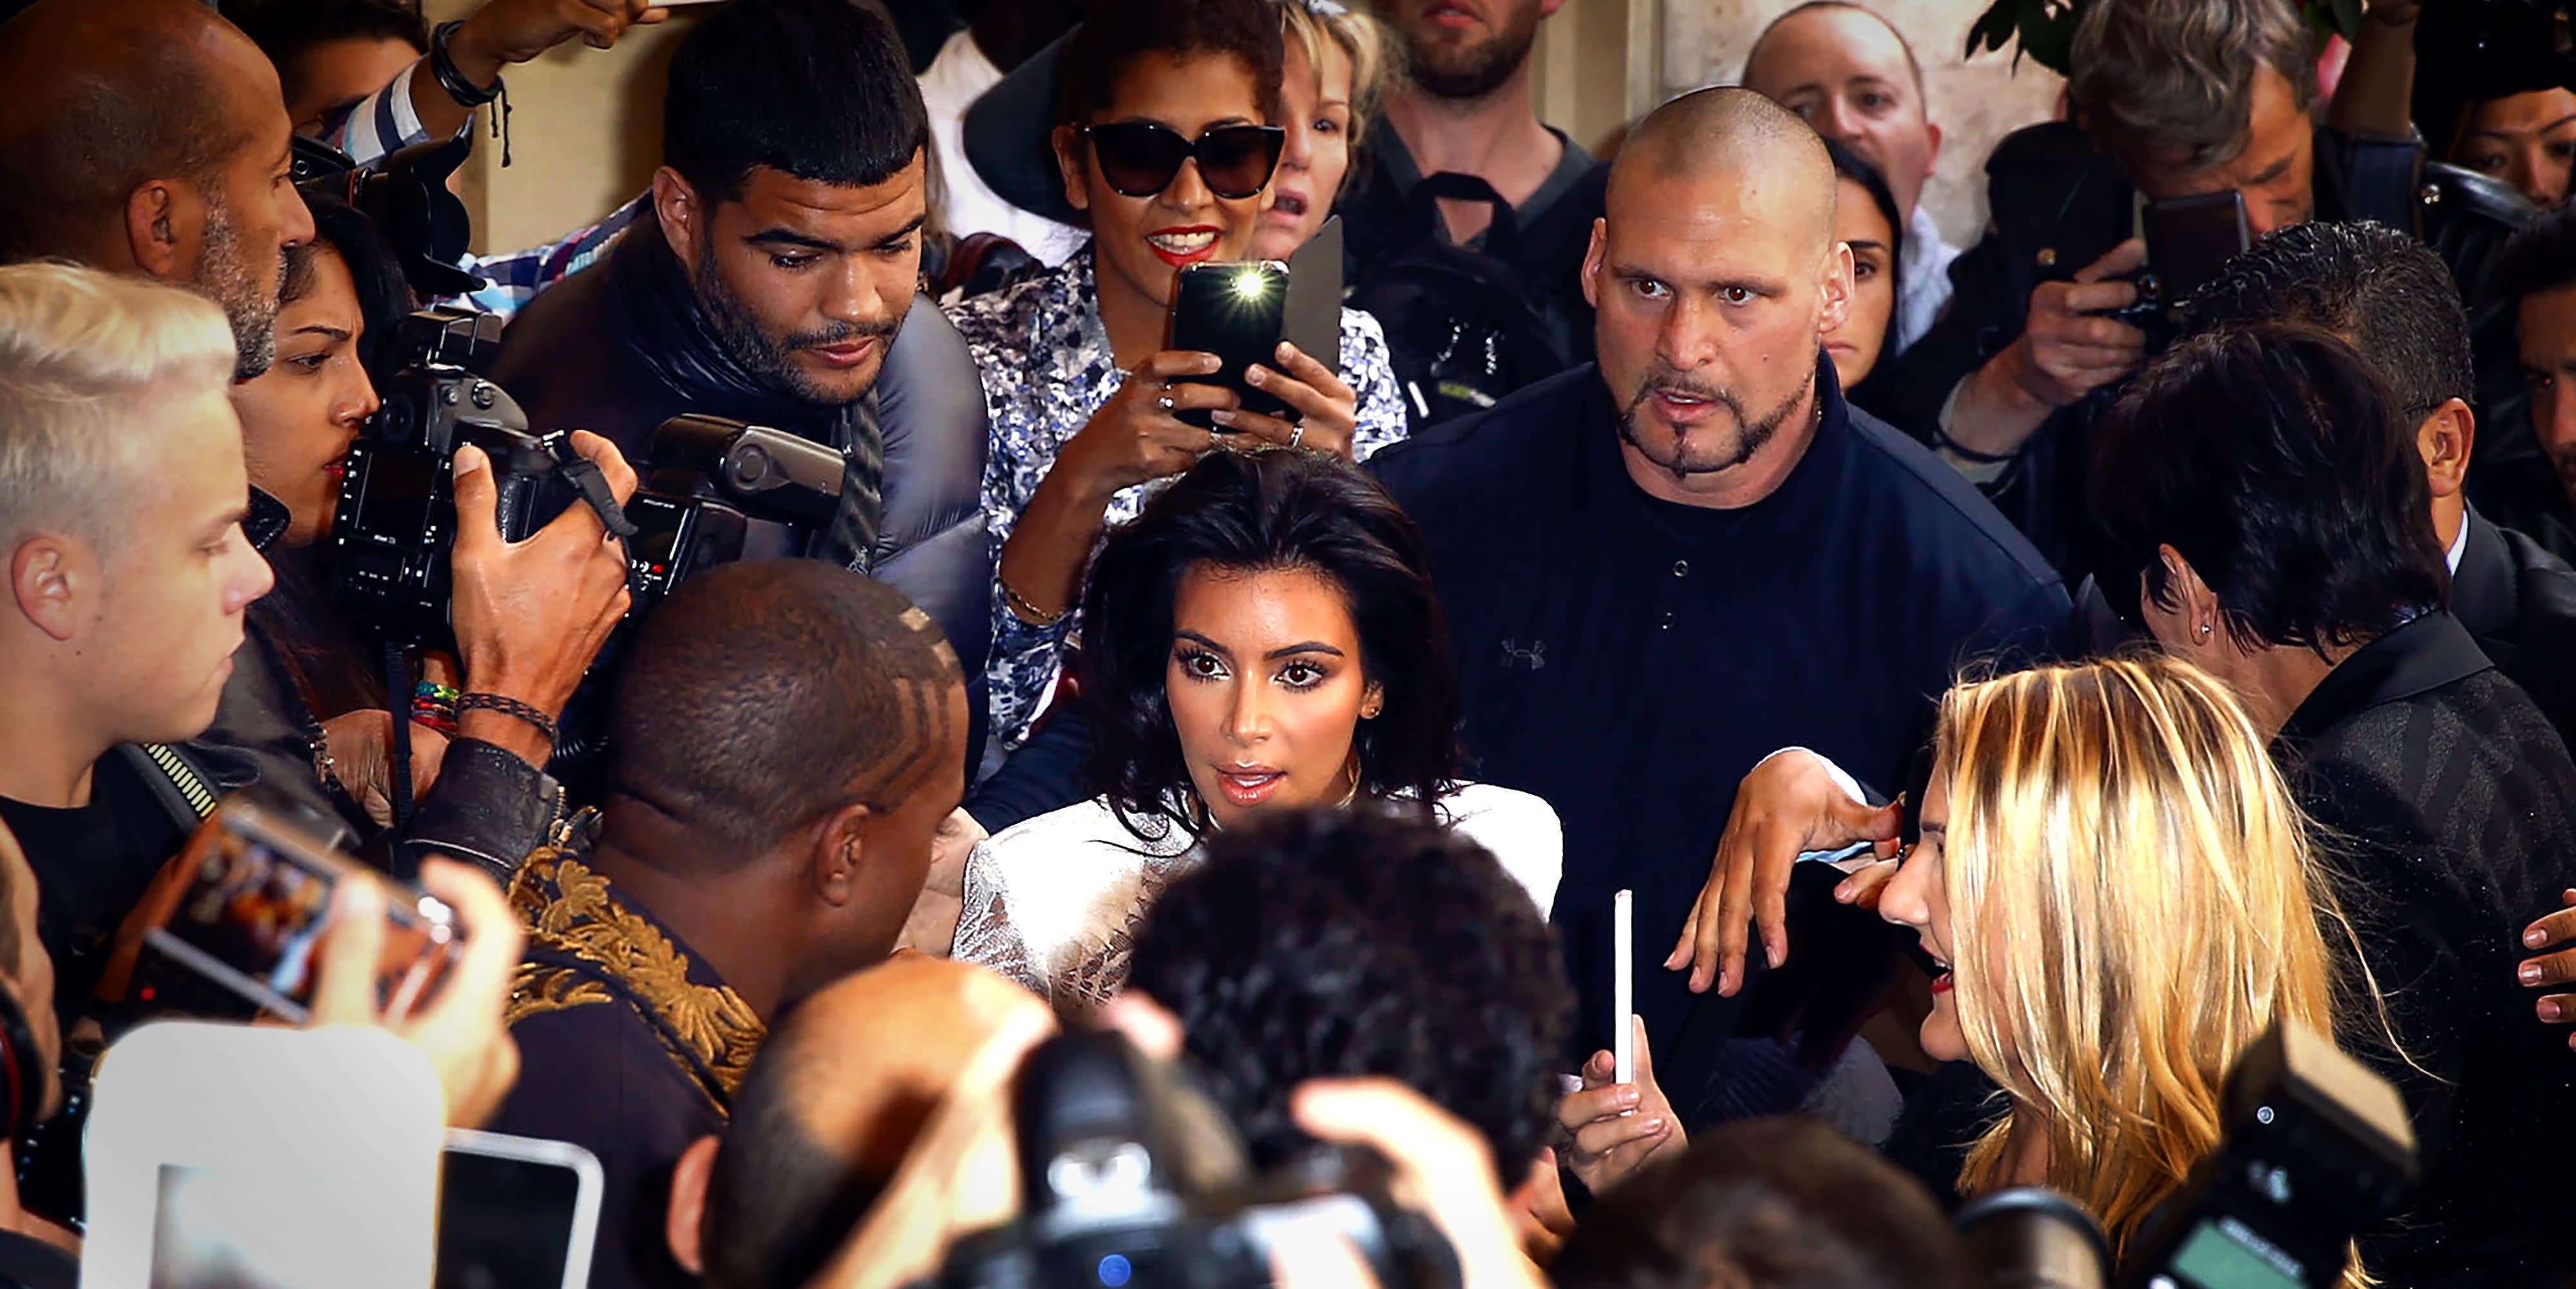 Celebrity Paparazzi Photos - X17 Online